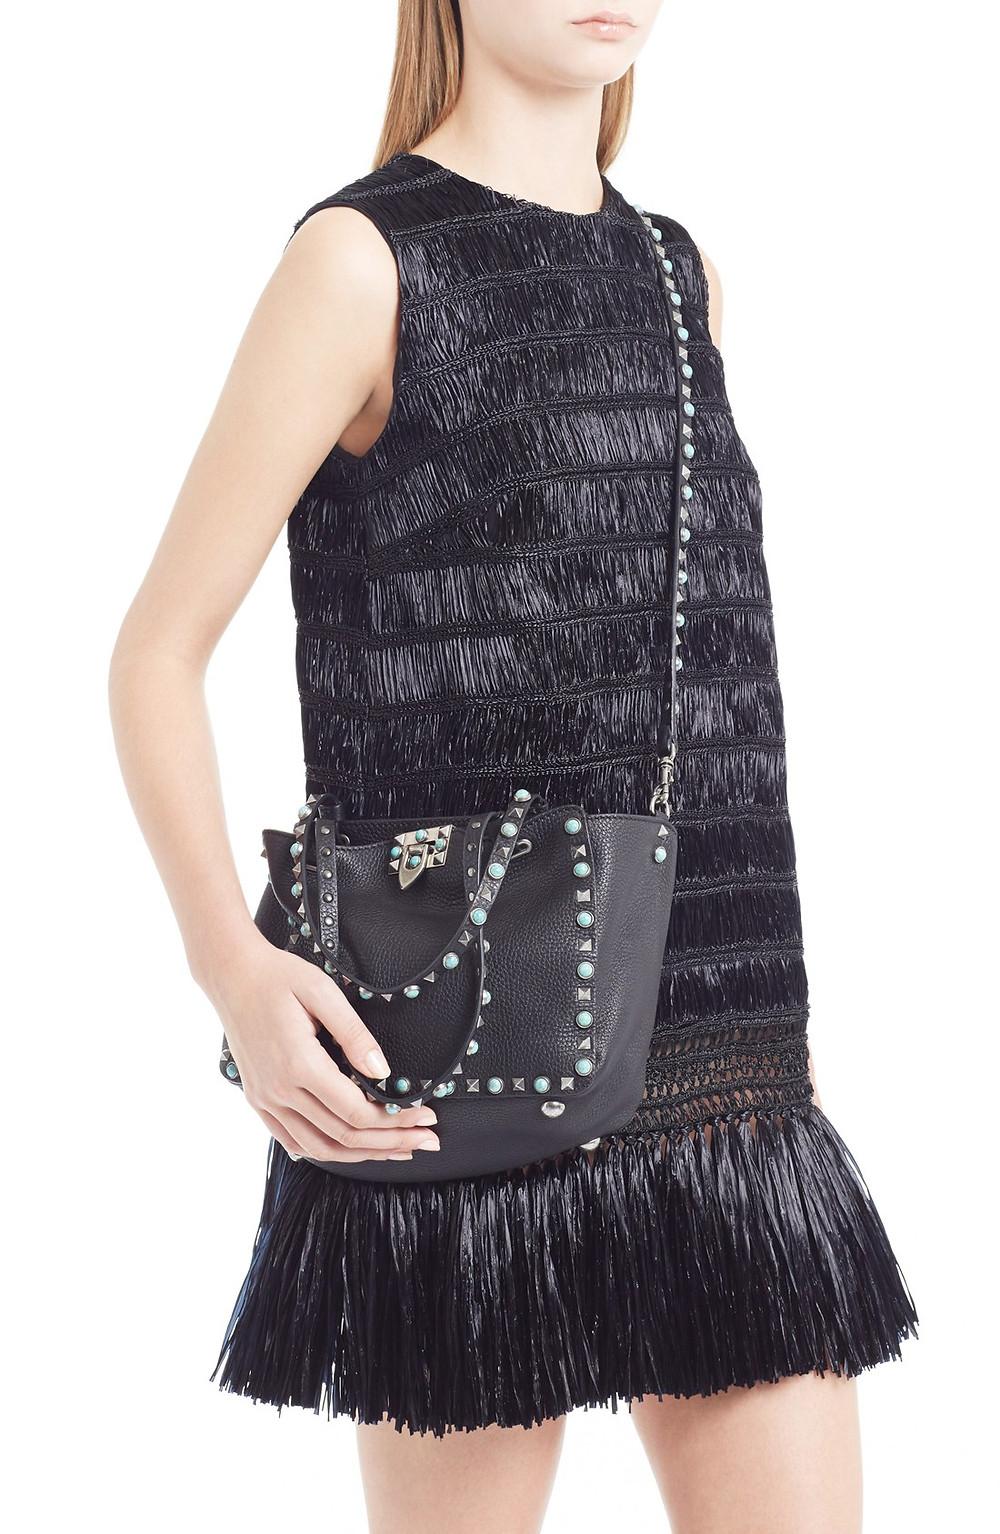 Valentino Fringe Trim Raffia Dress $3,950